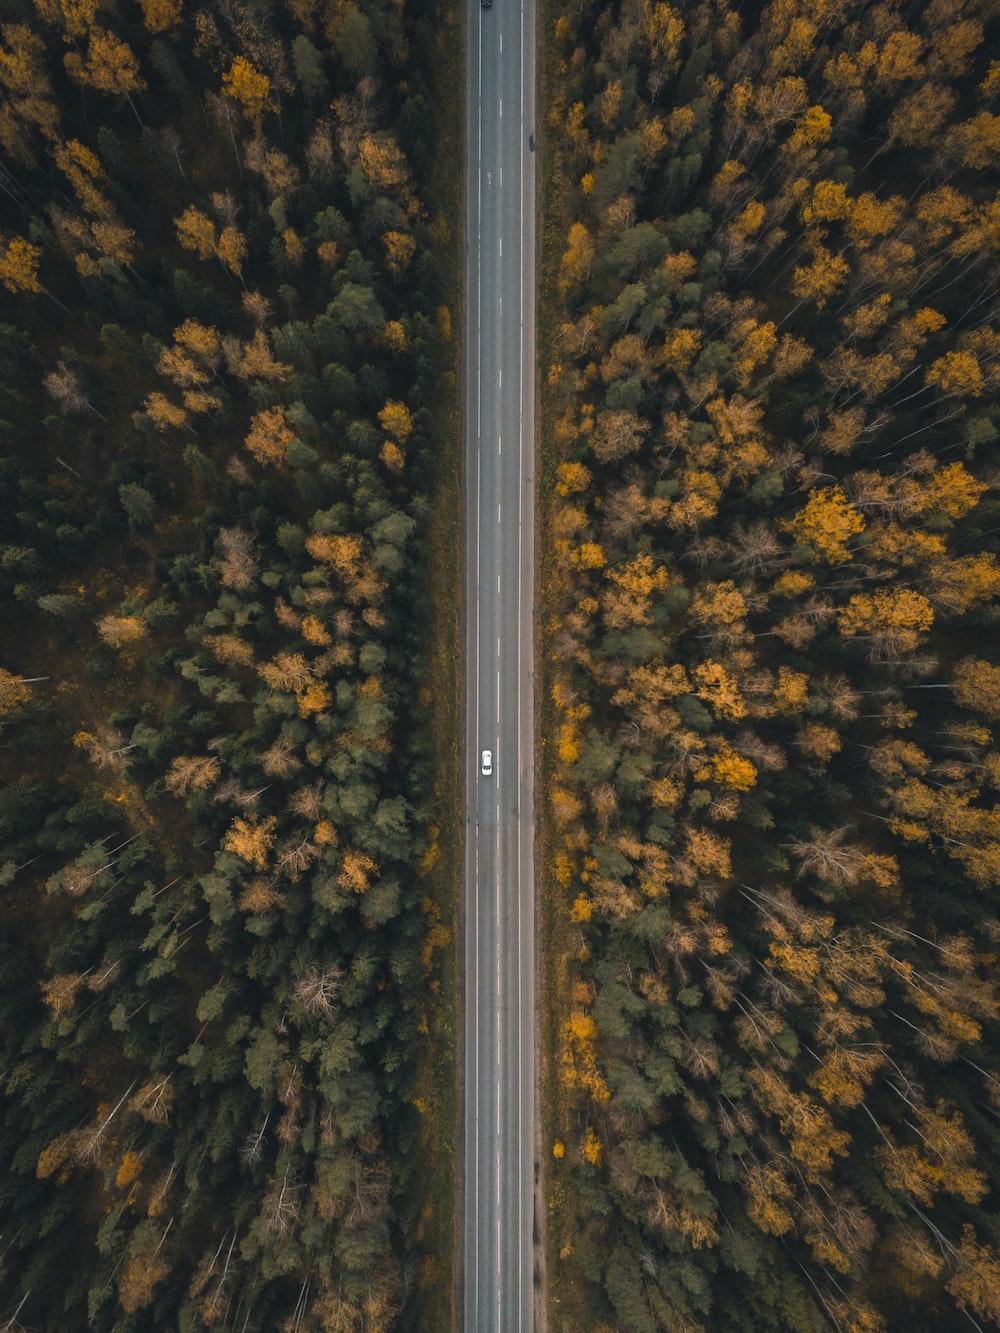 vehicle traveling on road between trees